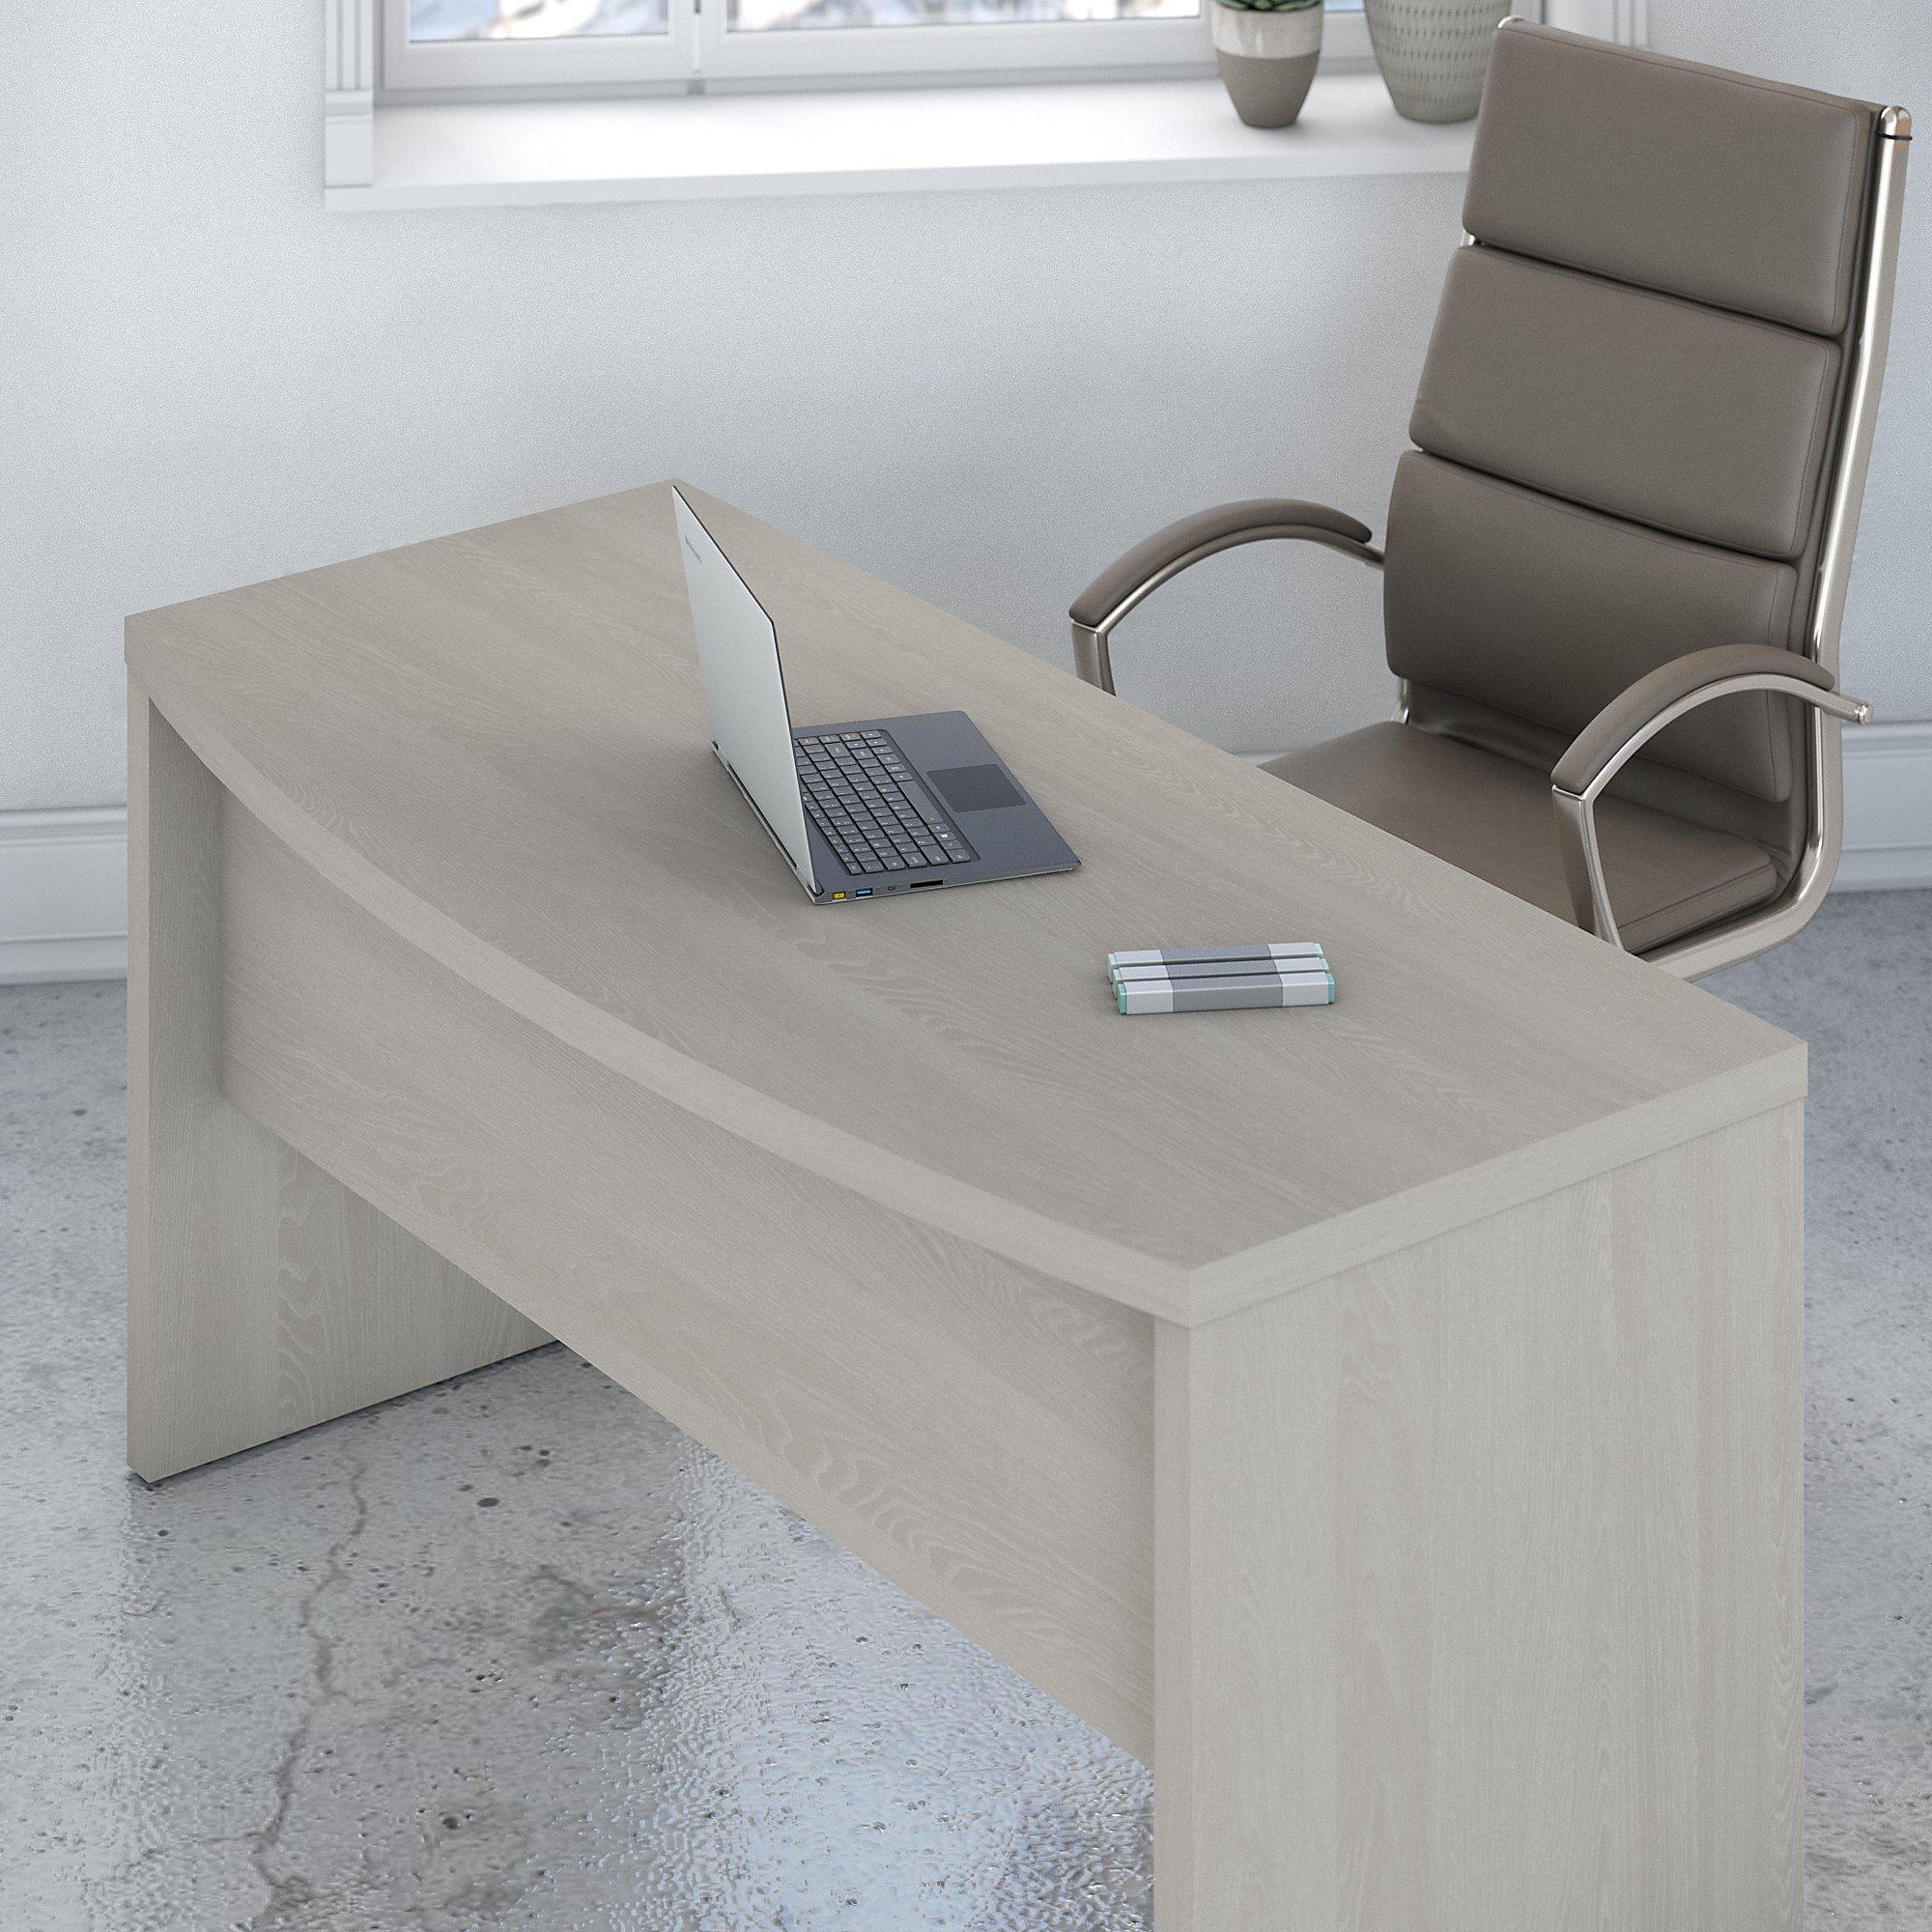 ech029 gray sand bow front desk